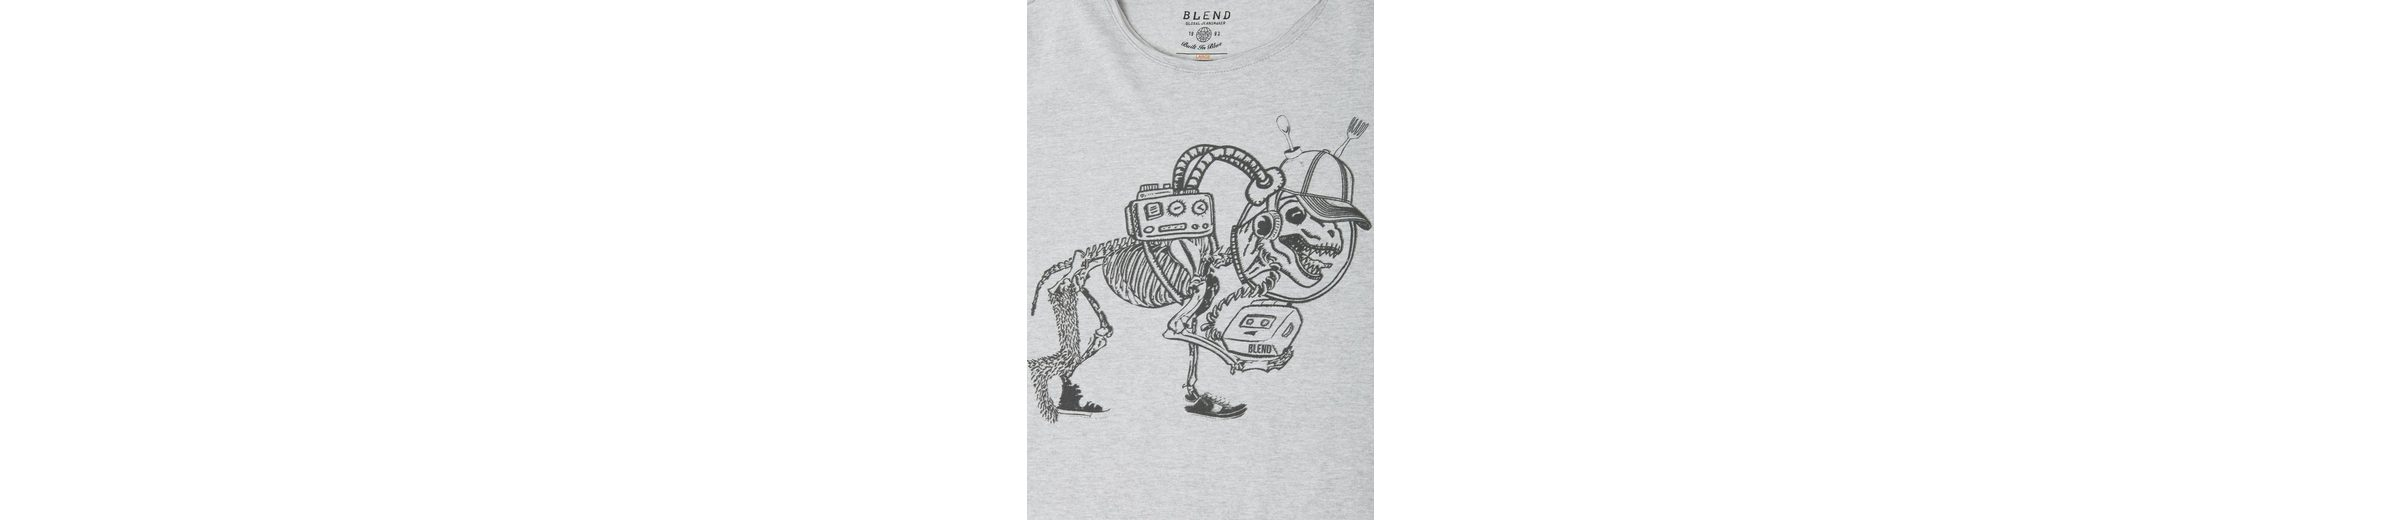 Rabatt Erwerben Neue Online Blend Print-Shirt pKsHI4